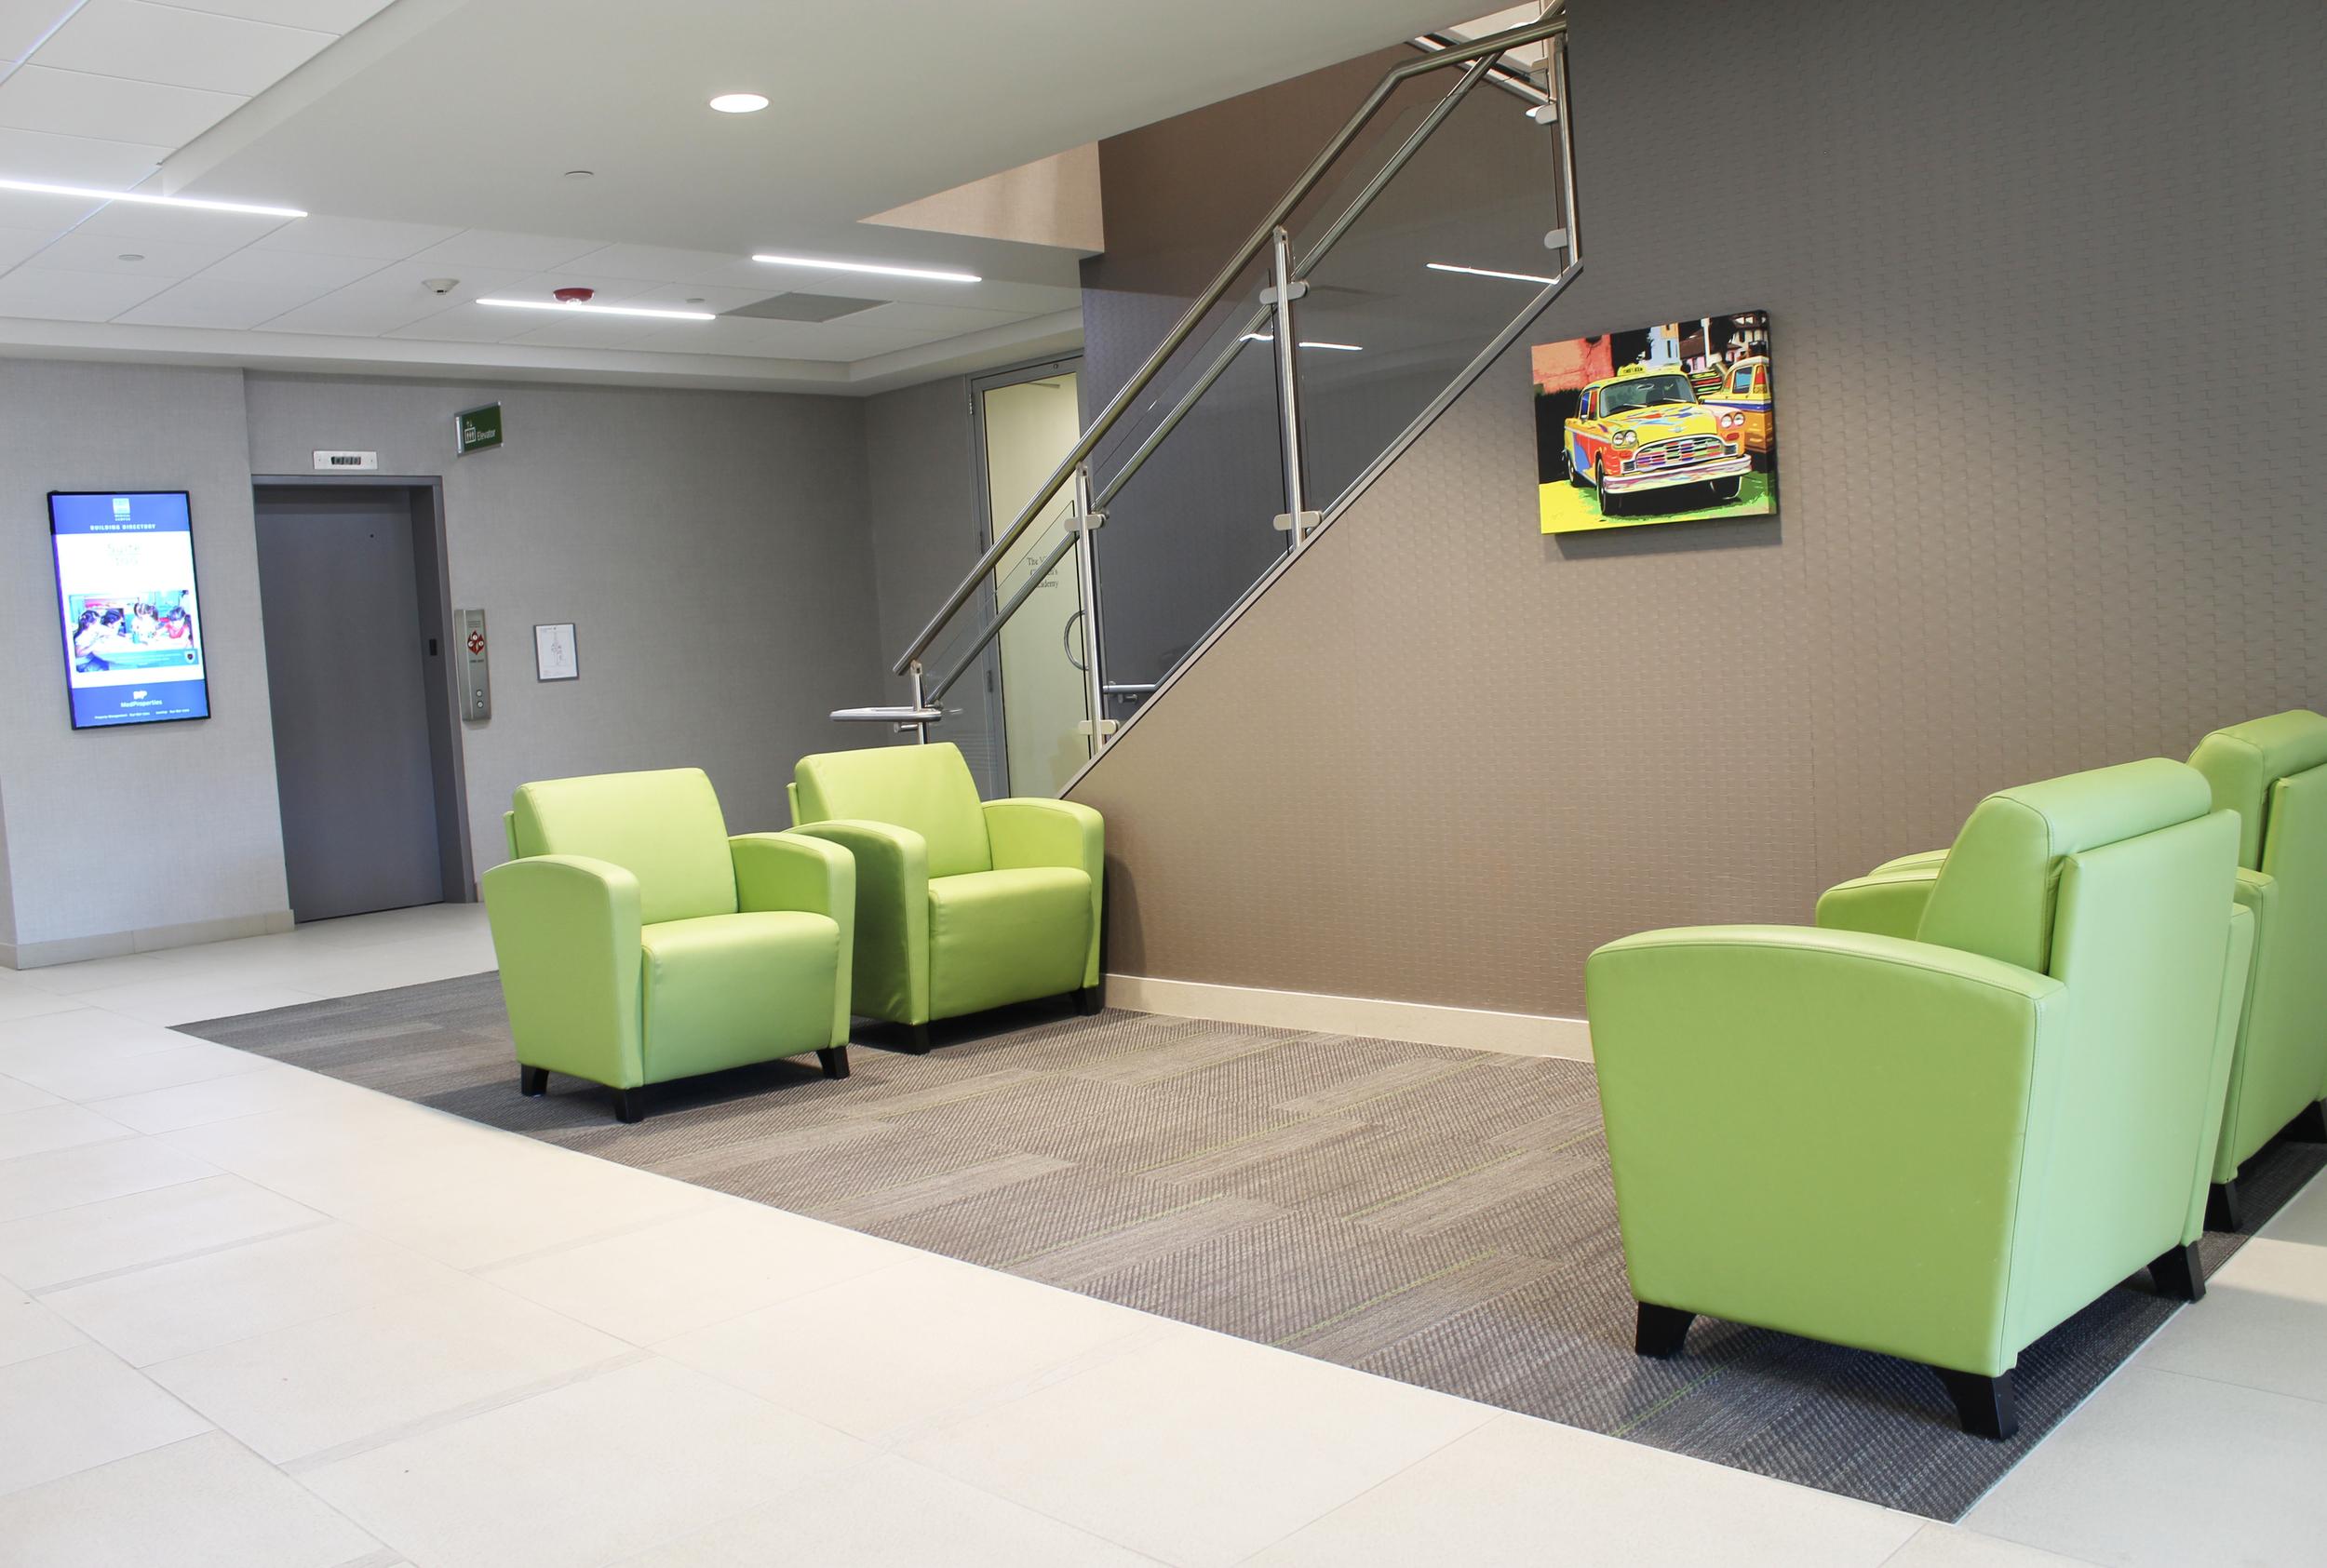 greenchairs.jpg